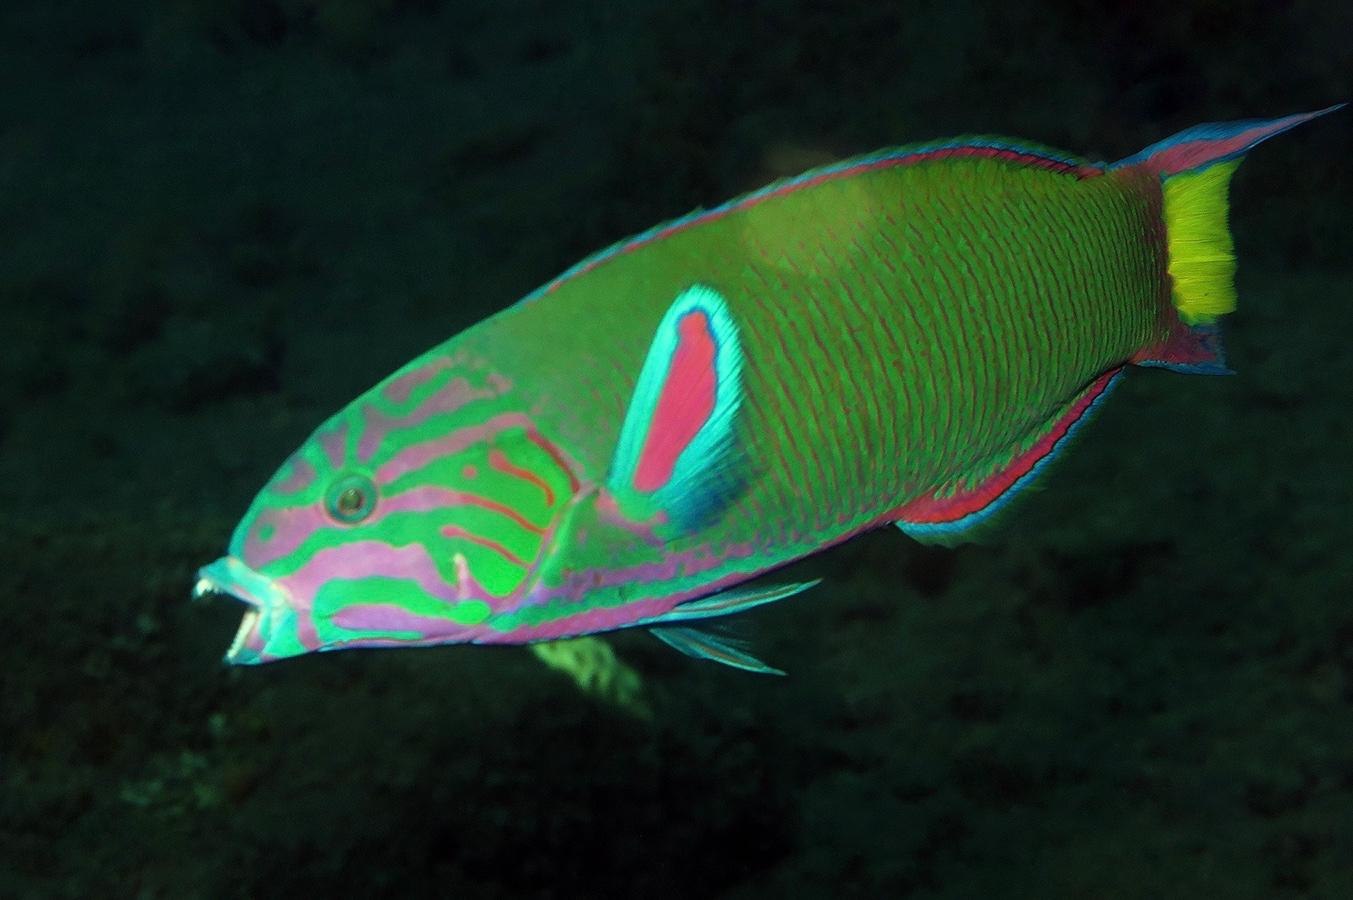 Thalassoma lunare     巴厘岛图蓝本 Tulamben 印度尼西亚 Indonesia @lazydiving.com 潜水时光